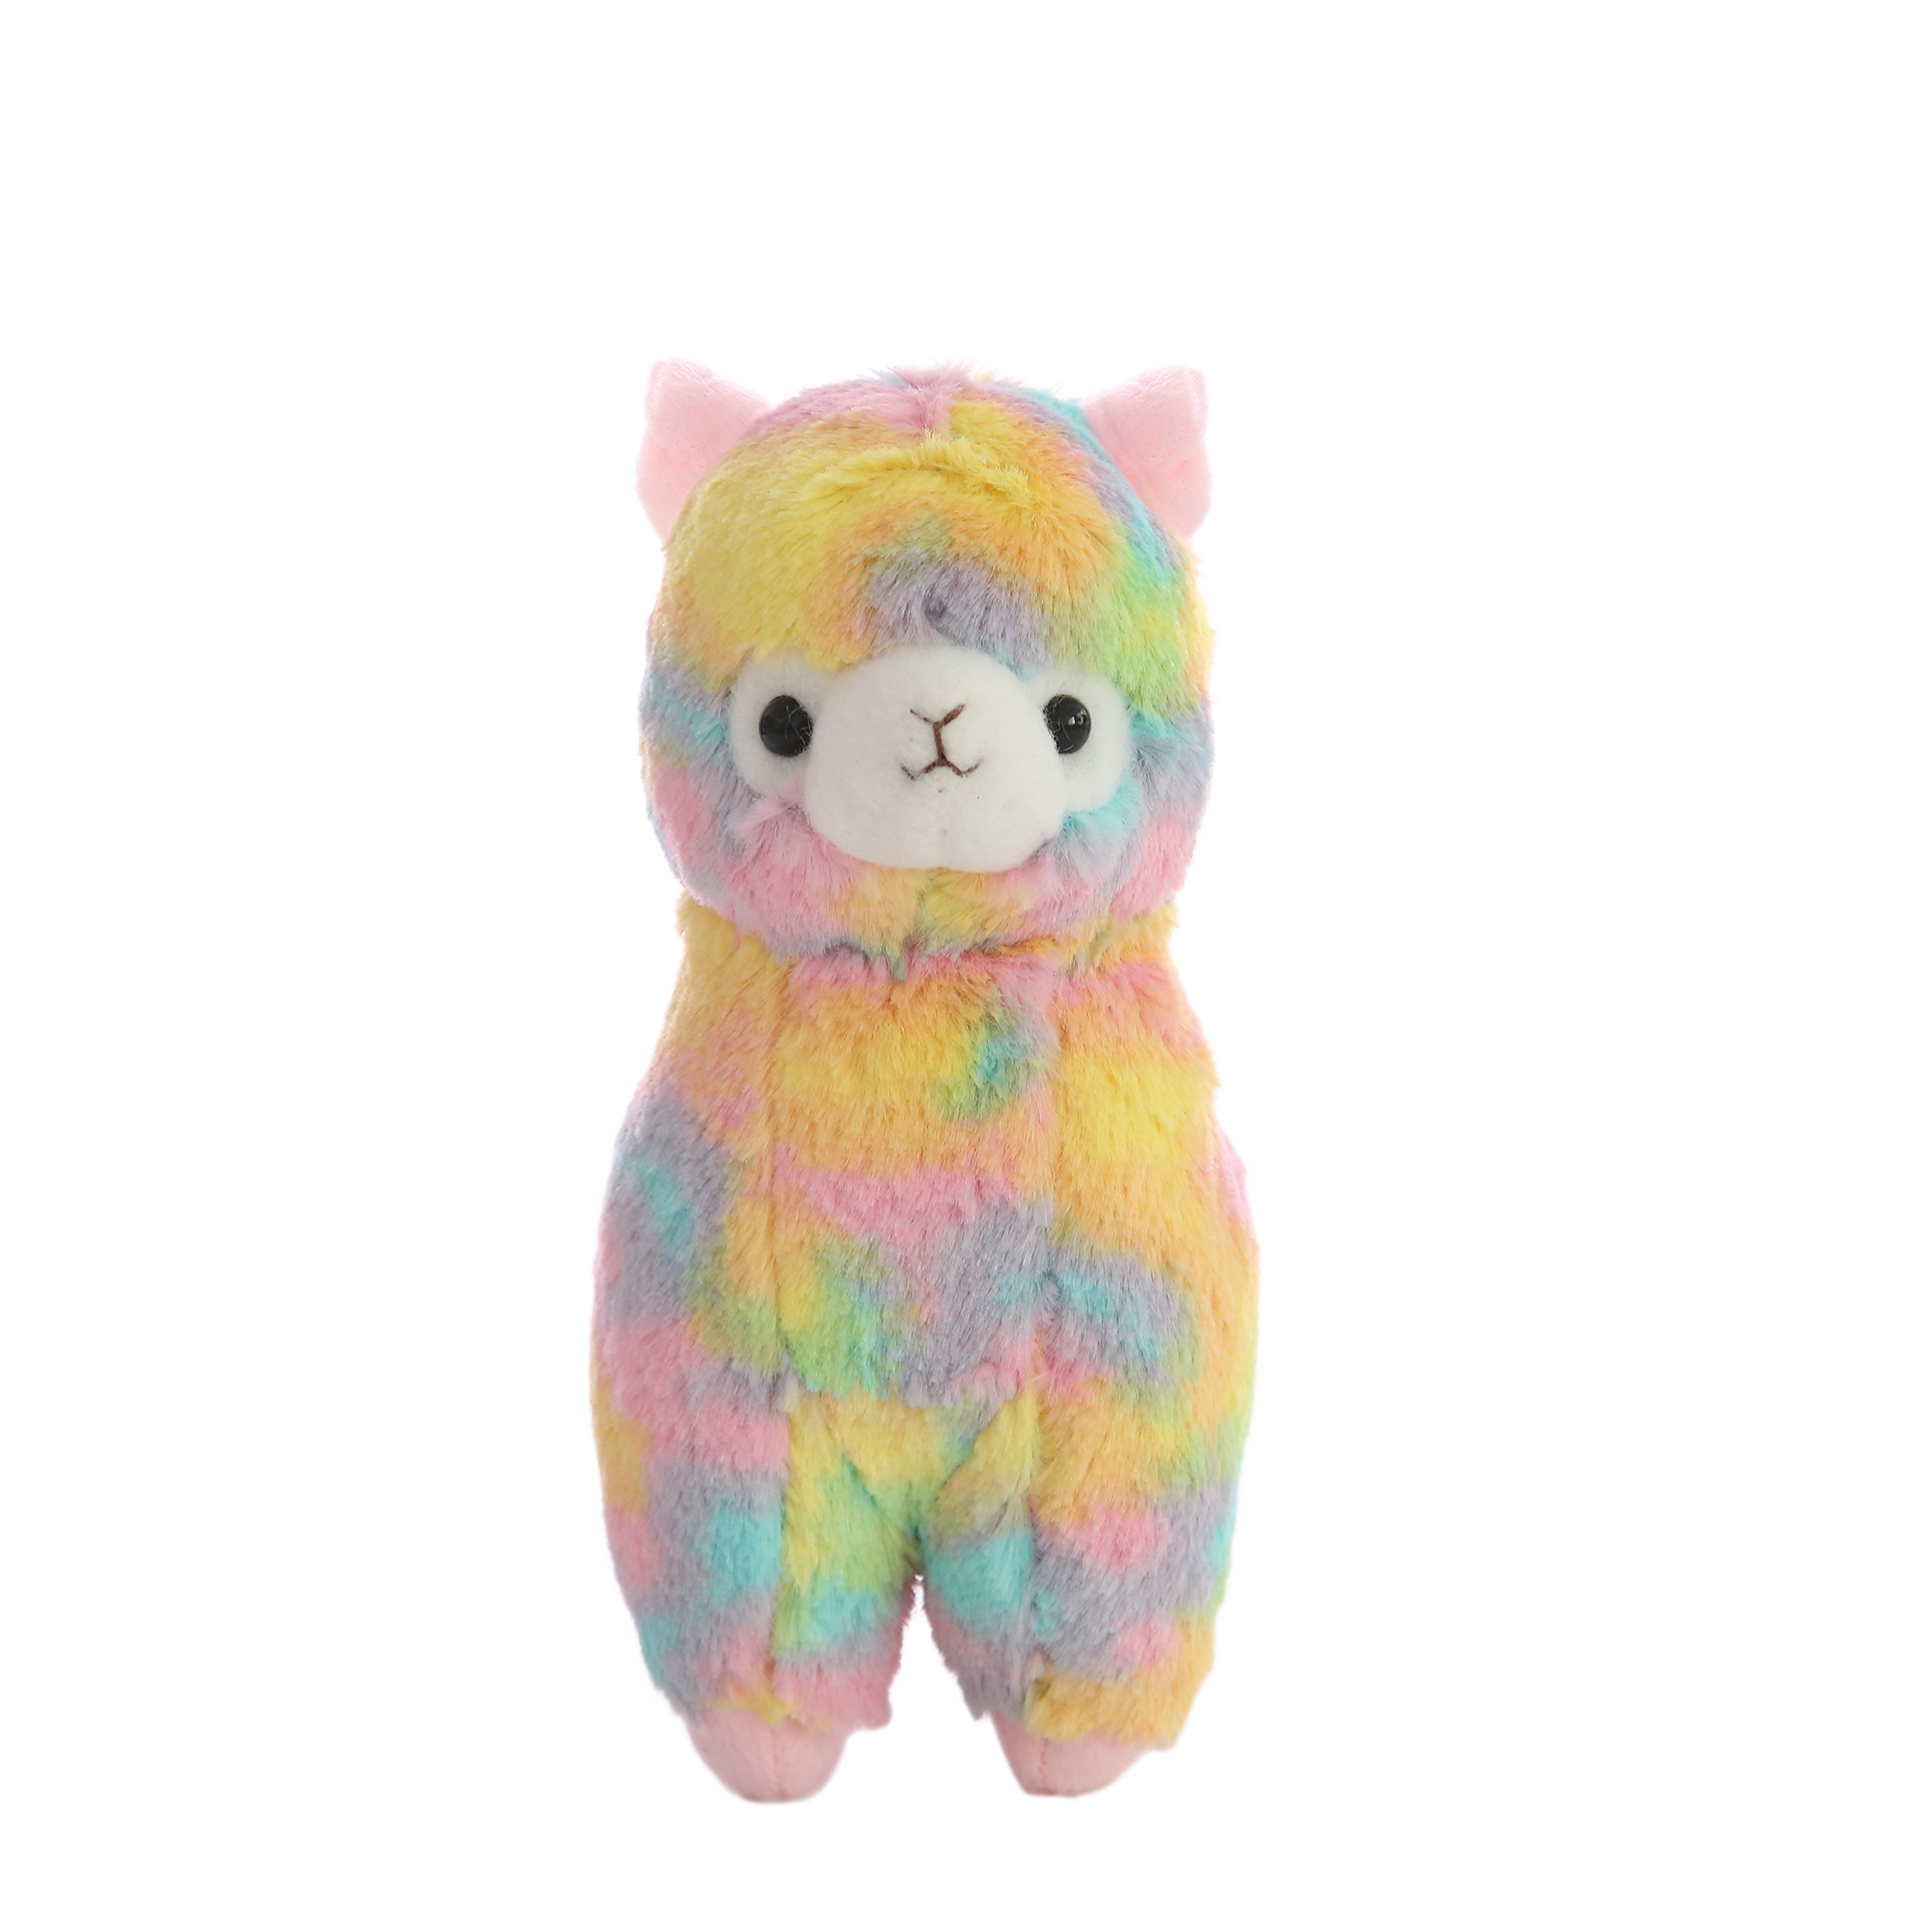 Cuddly Soft Stuffed Toy 7 '' Llama Rainbow Alpaca Doll Lamb Stuffed Animal Toys Kids' Plush Pillow Cushion Fiesta Toy Graduation Valentine's Day Birthday Xmas Christmas Best Gifts